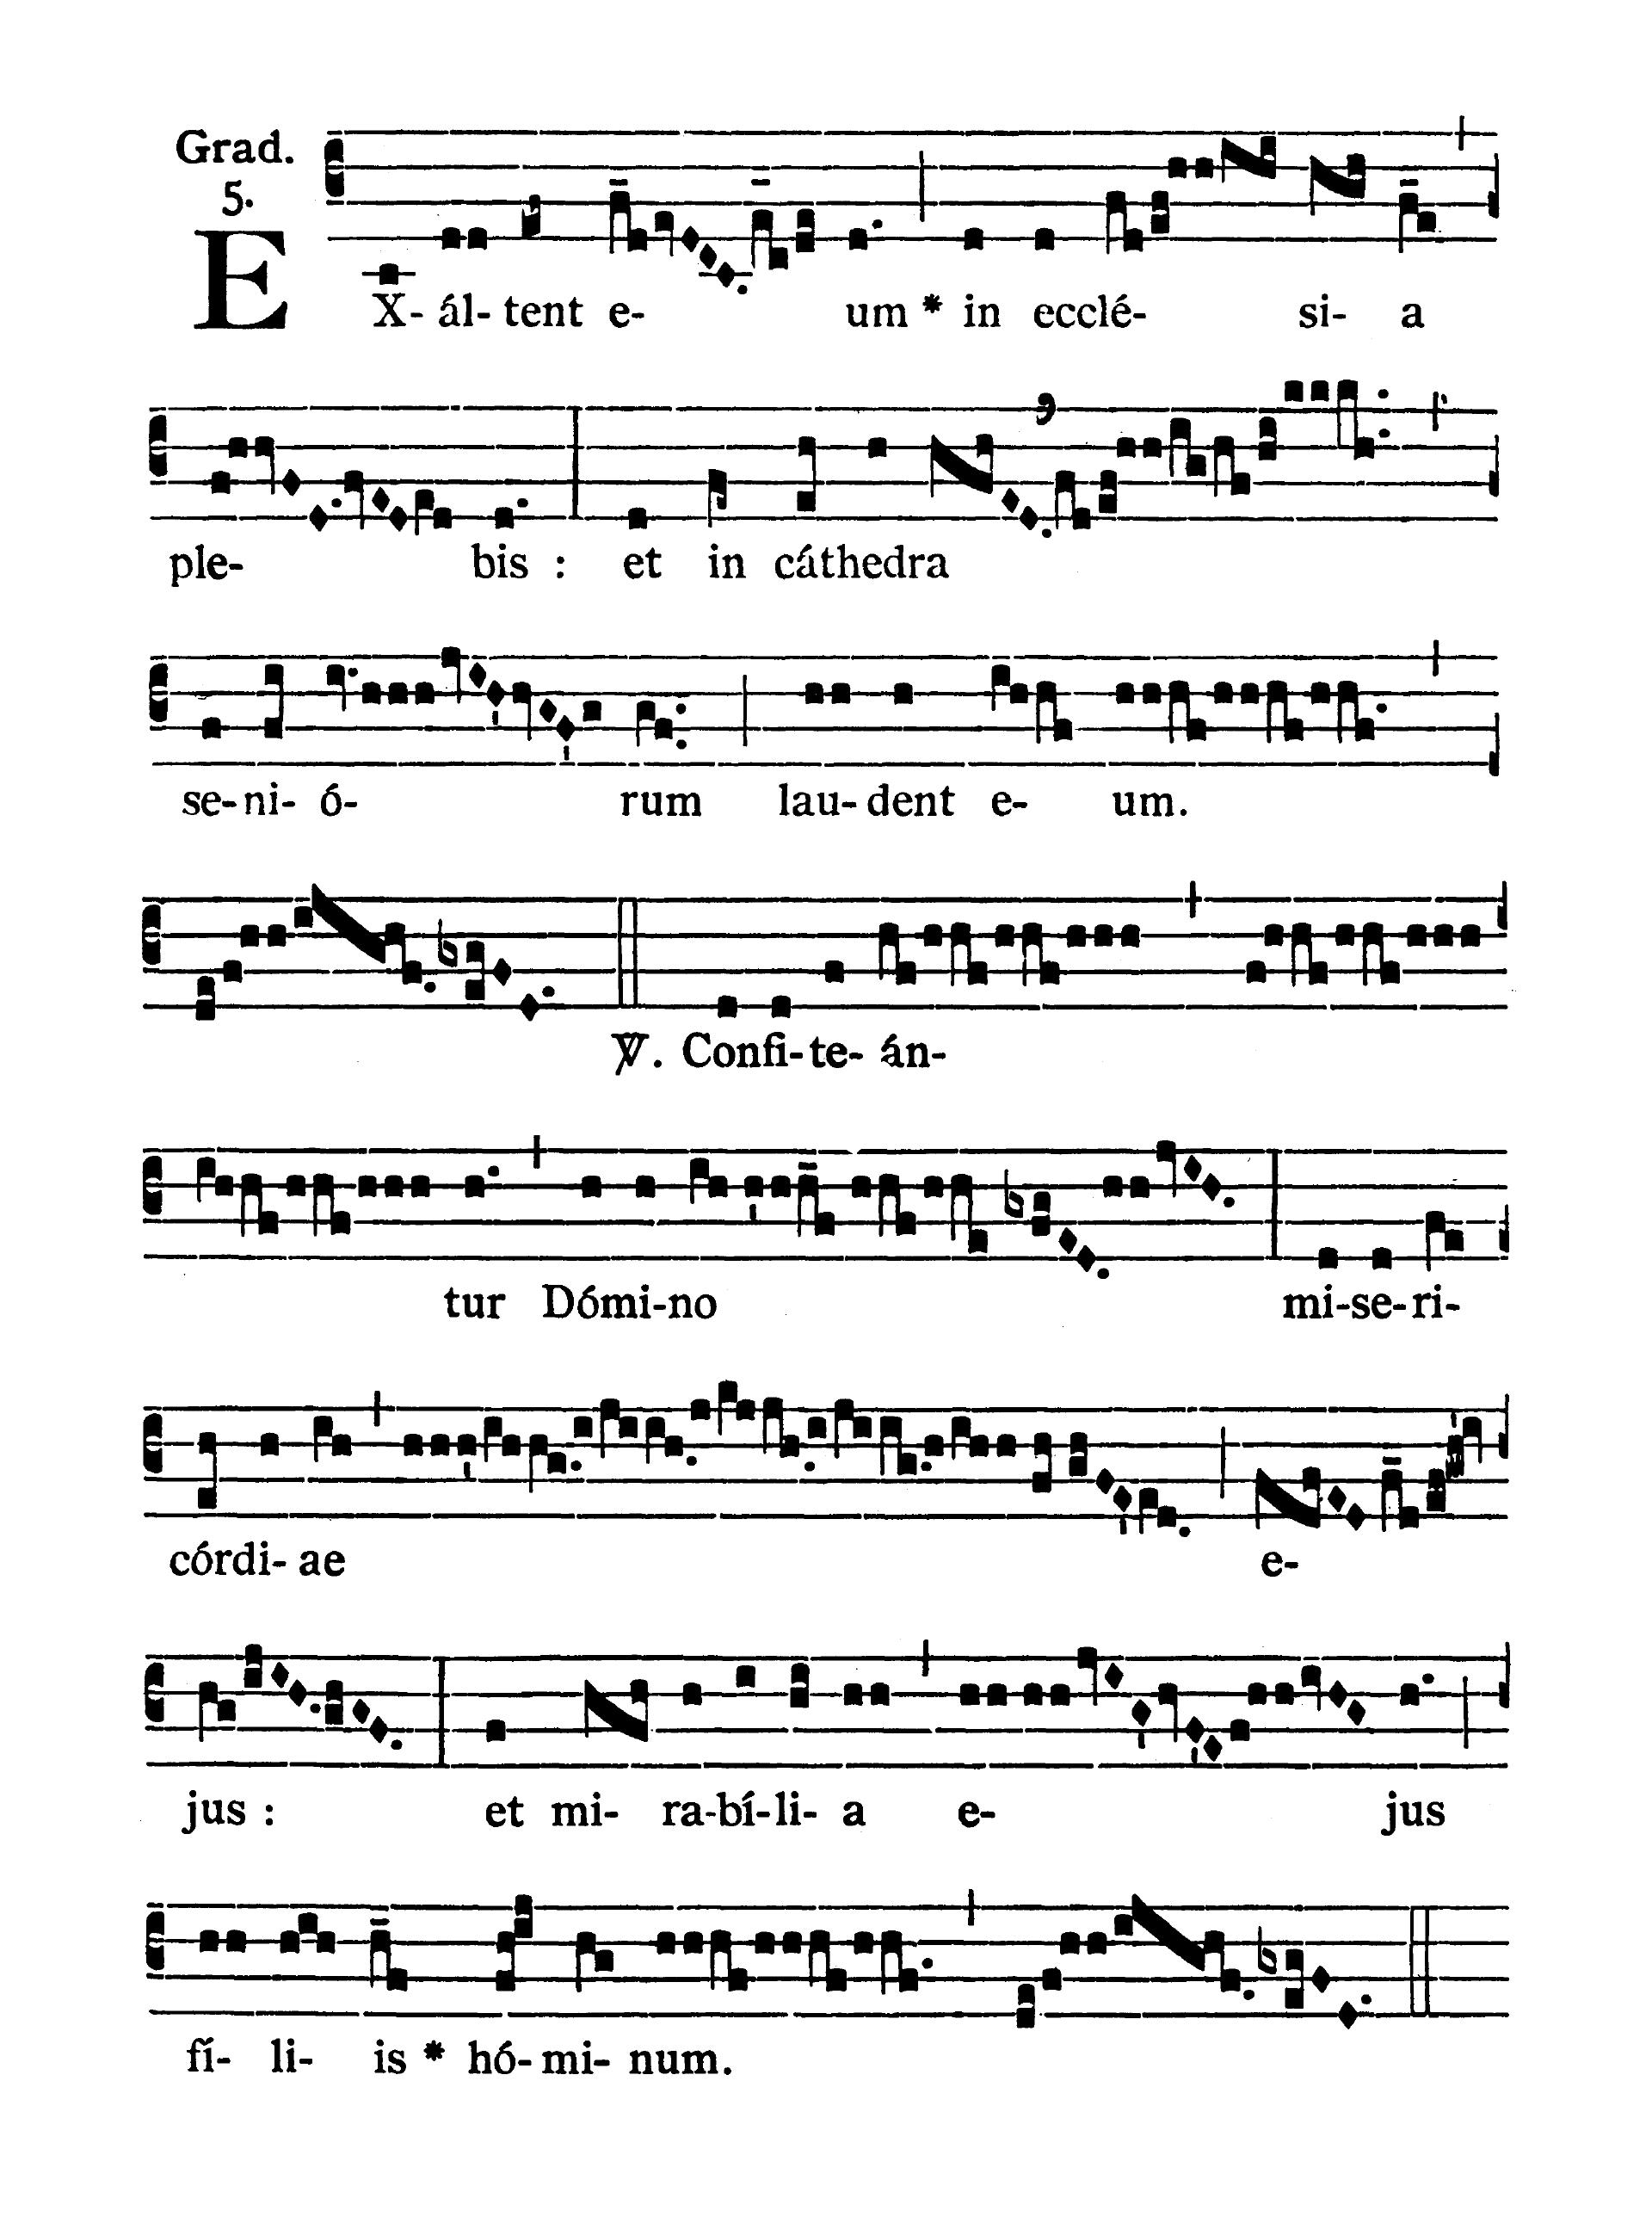 Sancti Telesphori Papae et Martyris (Świętego Telesfora Papieża i Męczennika) - Graduale (Exaltent eum)